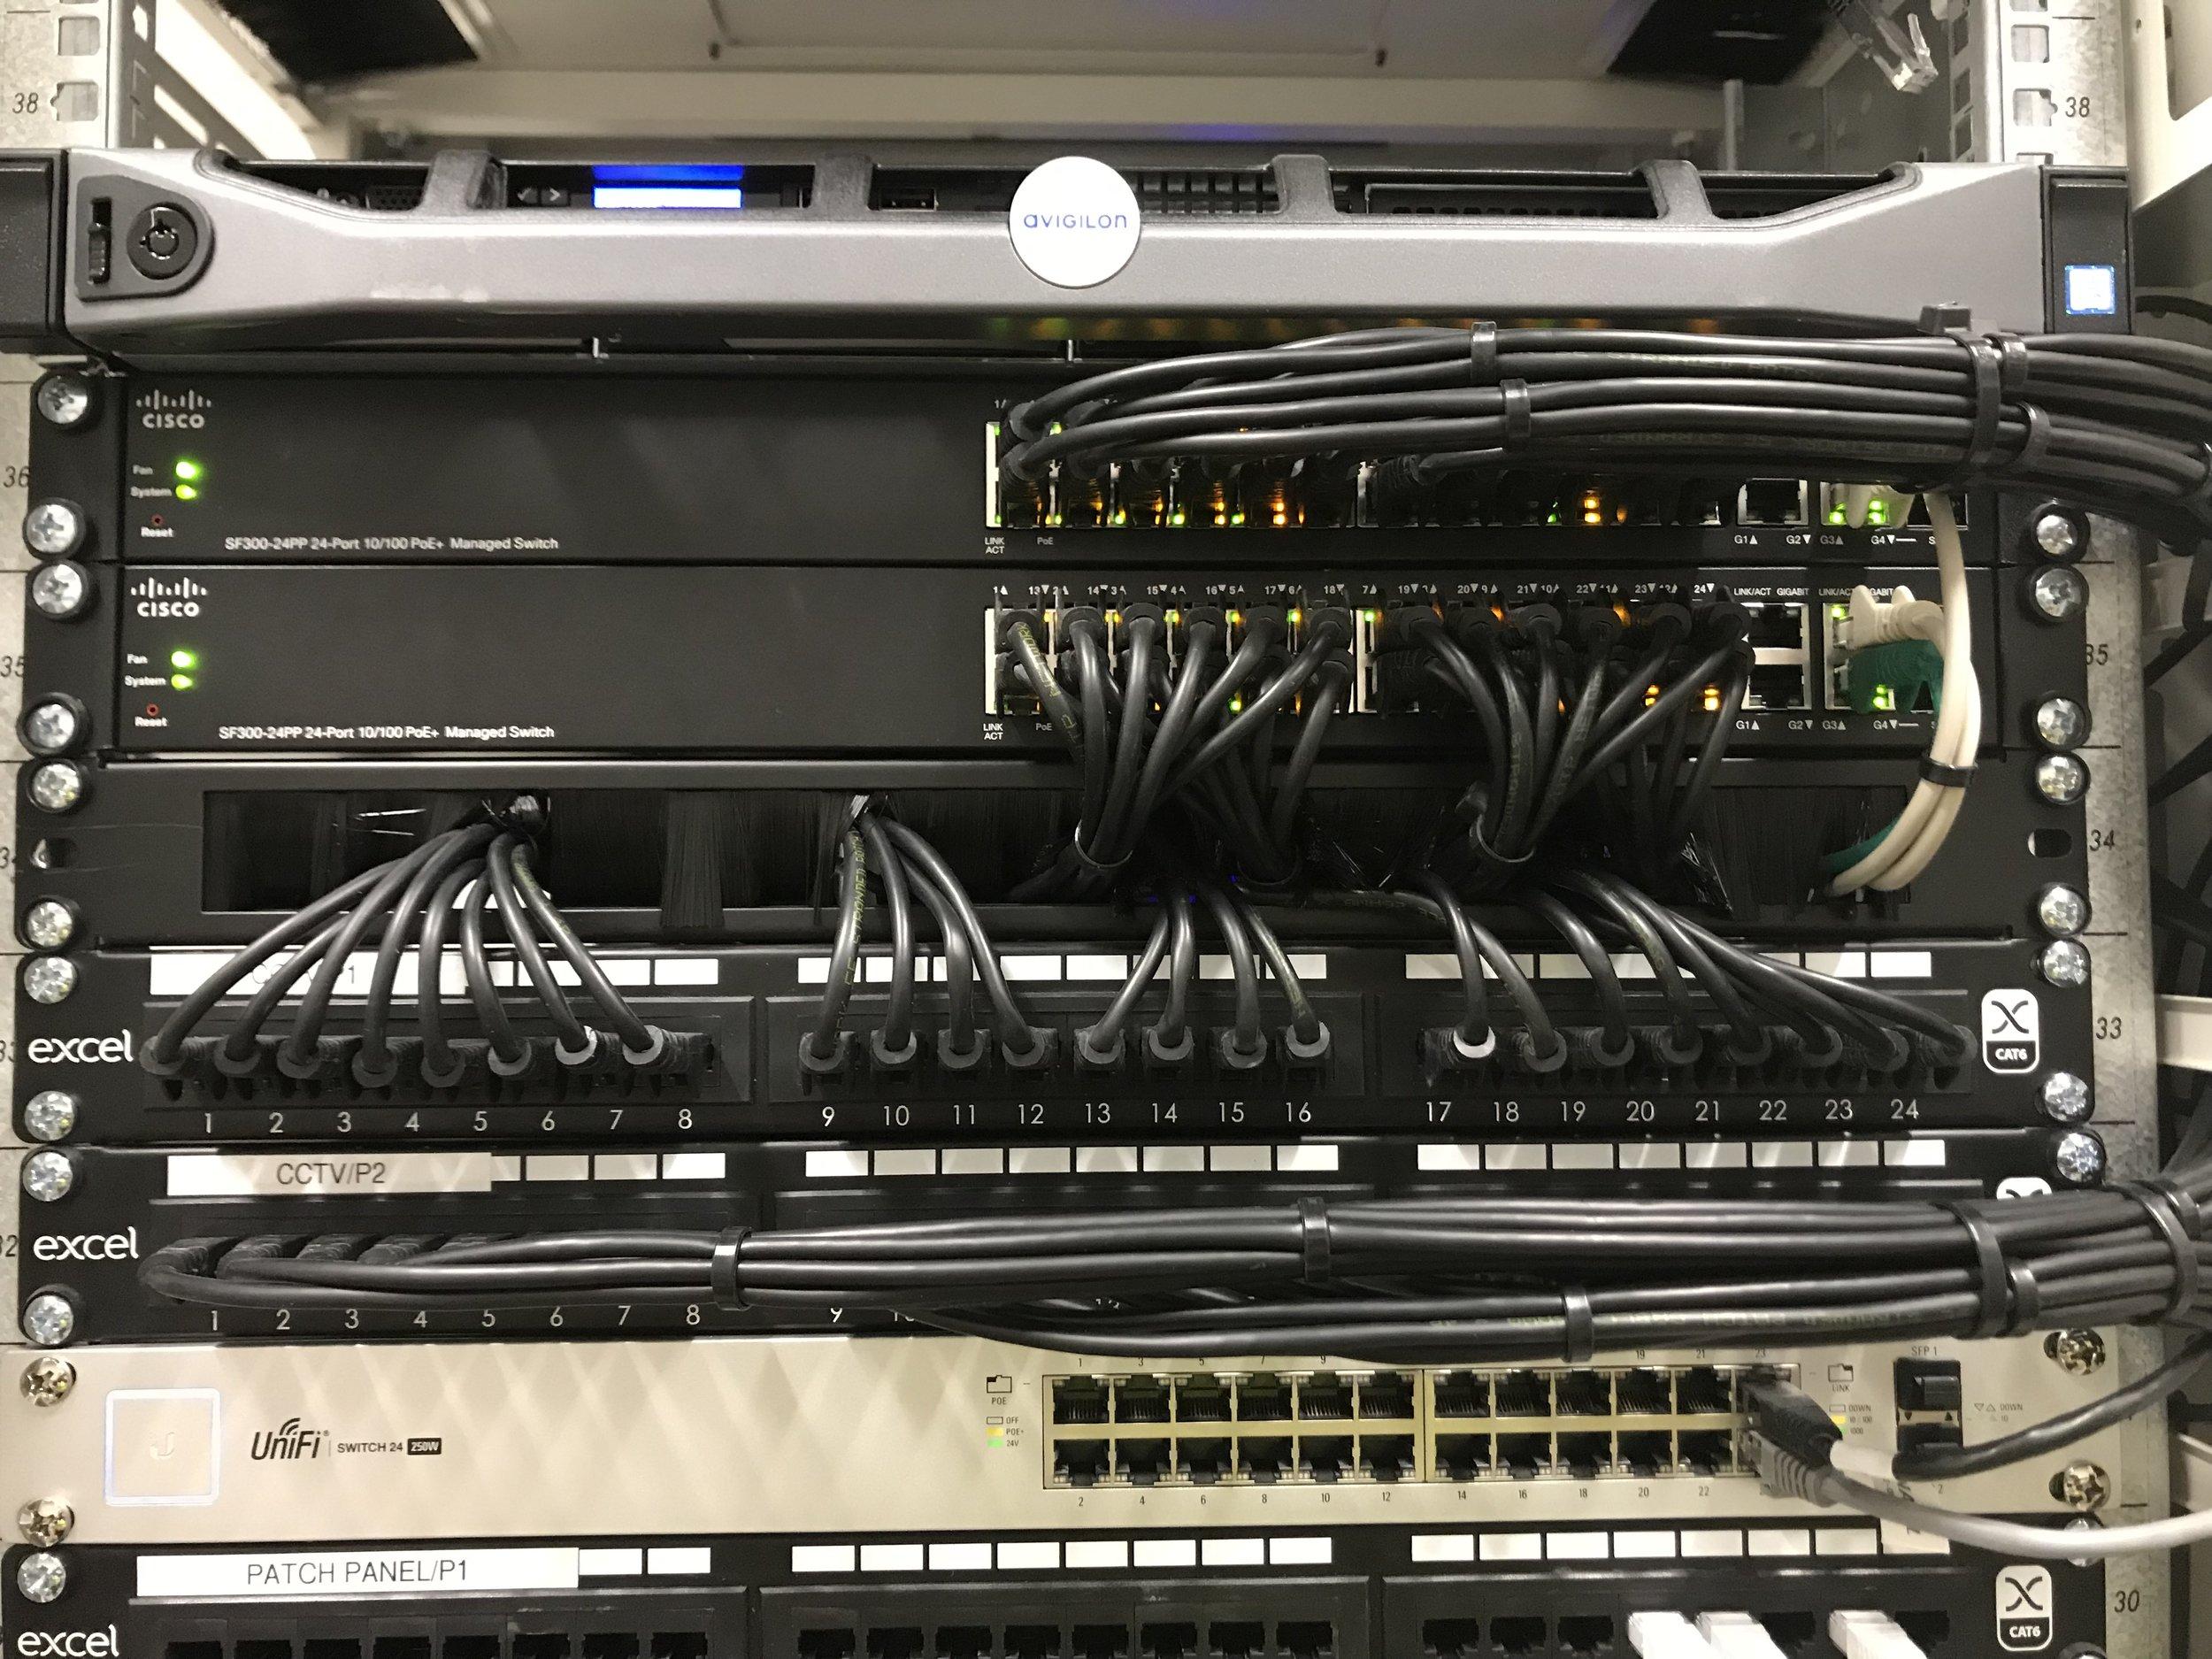 NVR3 rack mounted server